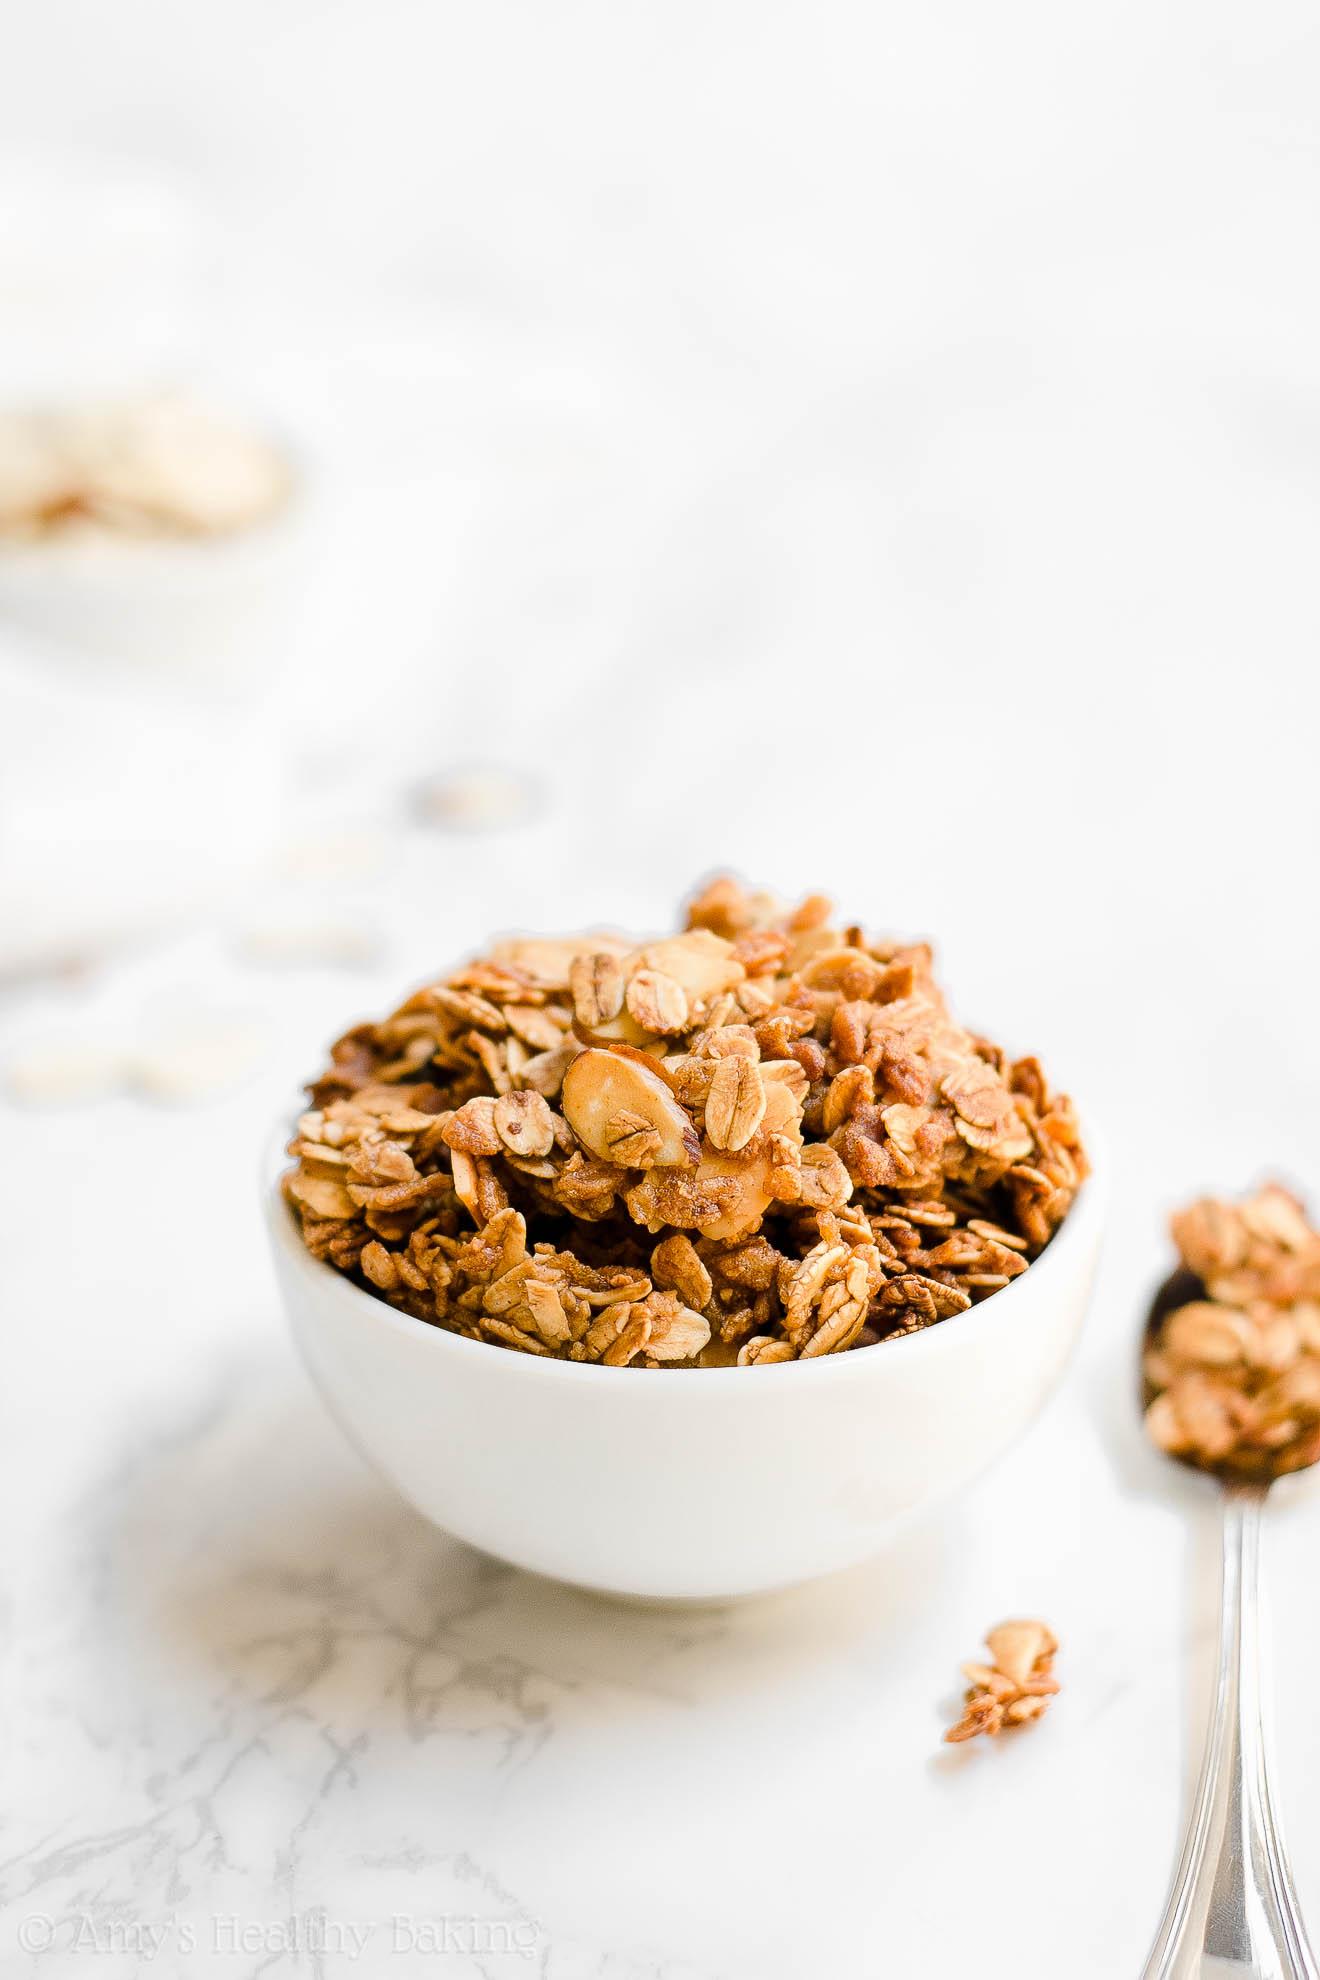 Healthy Crunchy Homemade Vanilla Almond Granola Clusters